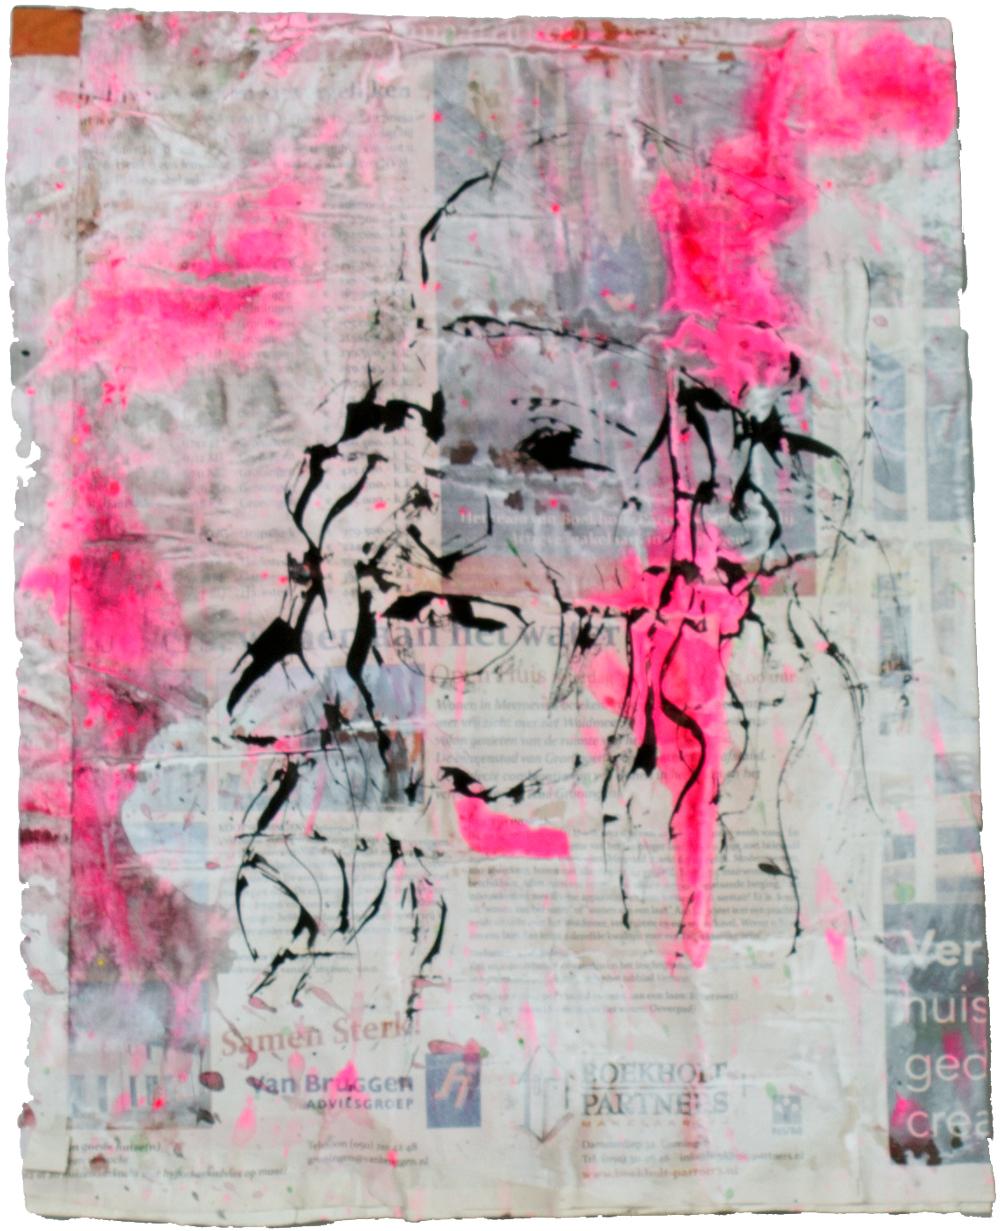 'portrait2'artwork,inc.fineartist.kerstinpressler.com